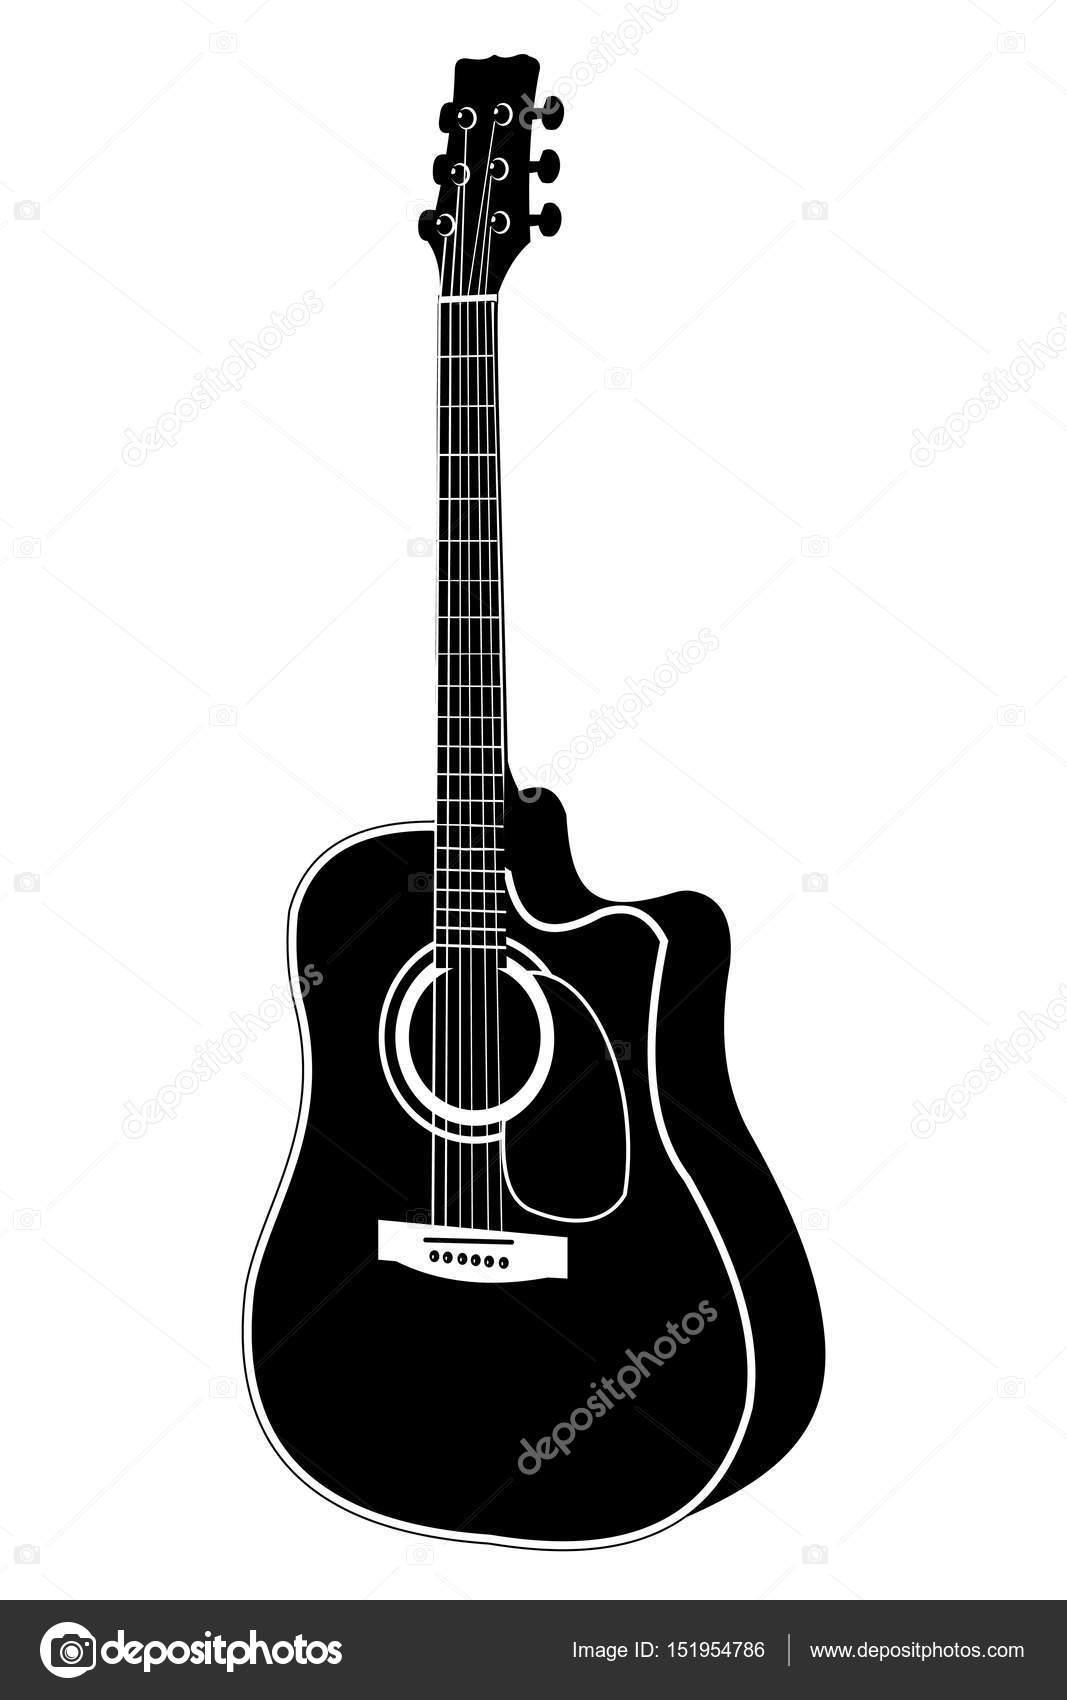 acoustic guitar vector illustration stock vector darafeja 151954786 rh depositphotos com acoustic guitar vector free download acoustic guitar vector outline